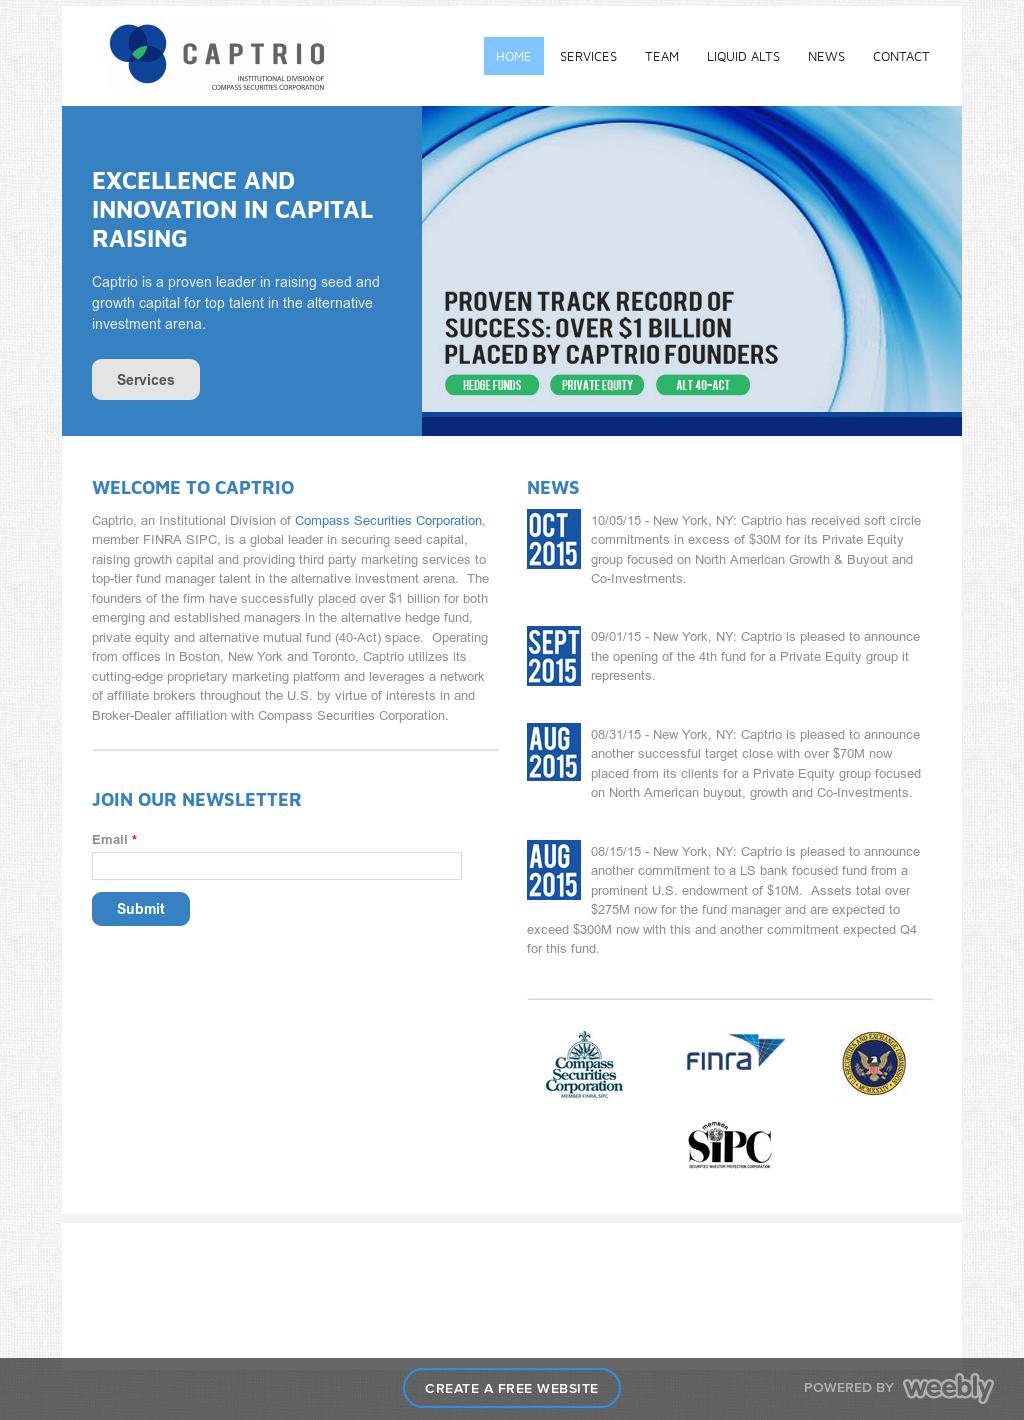 Captrio Competitors, Revenue and Employees - Owler Company Profile